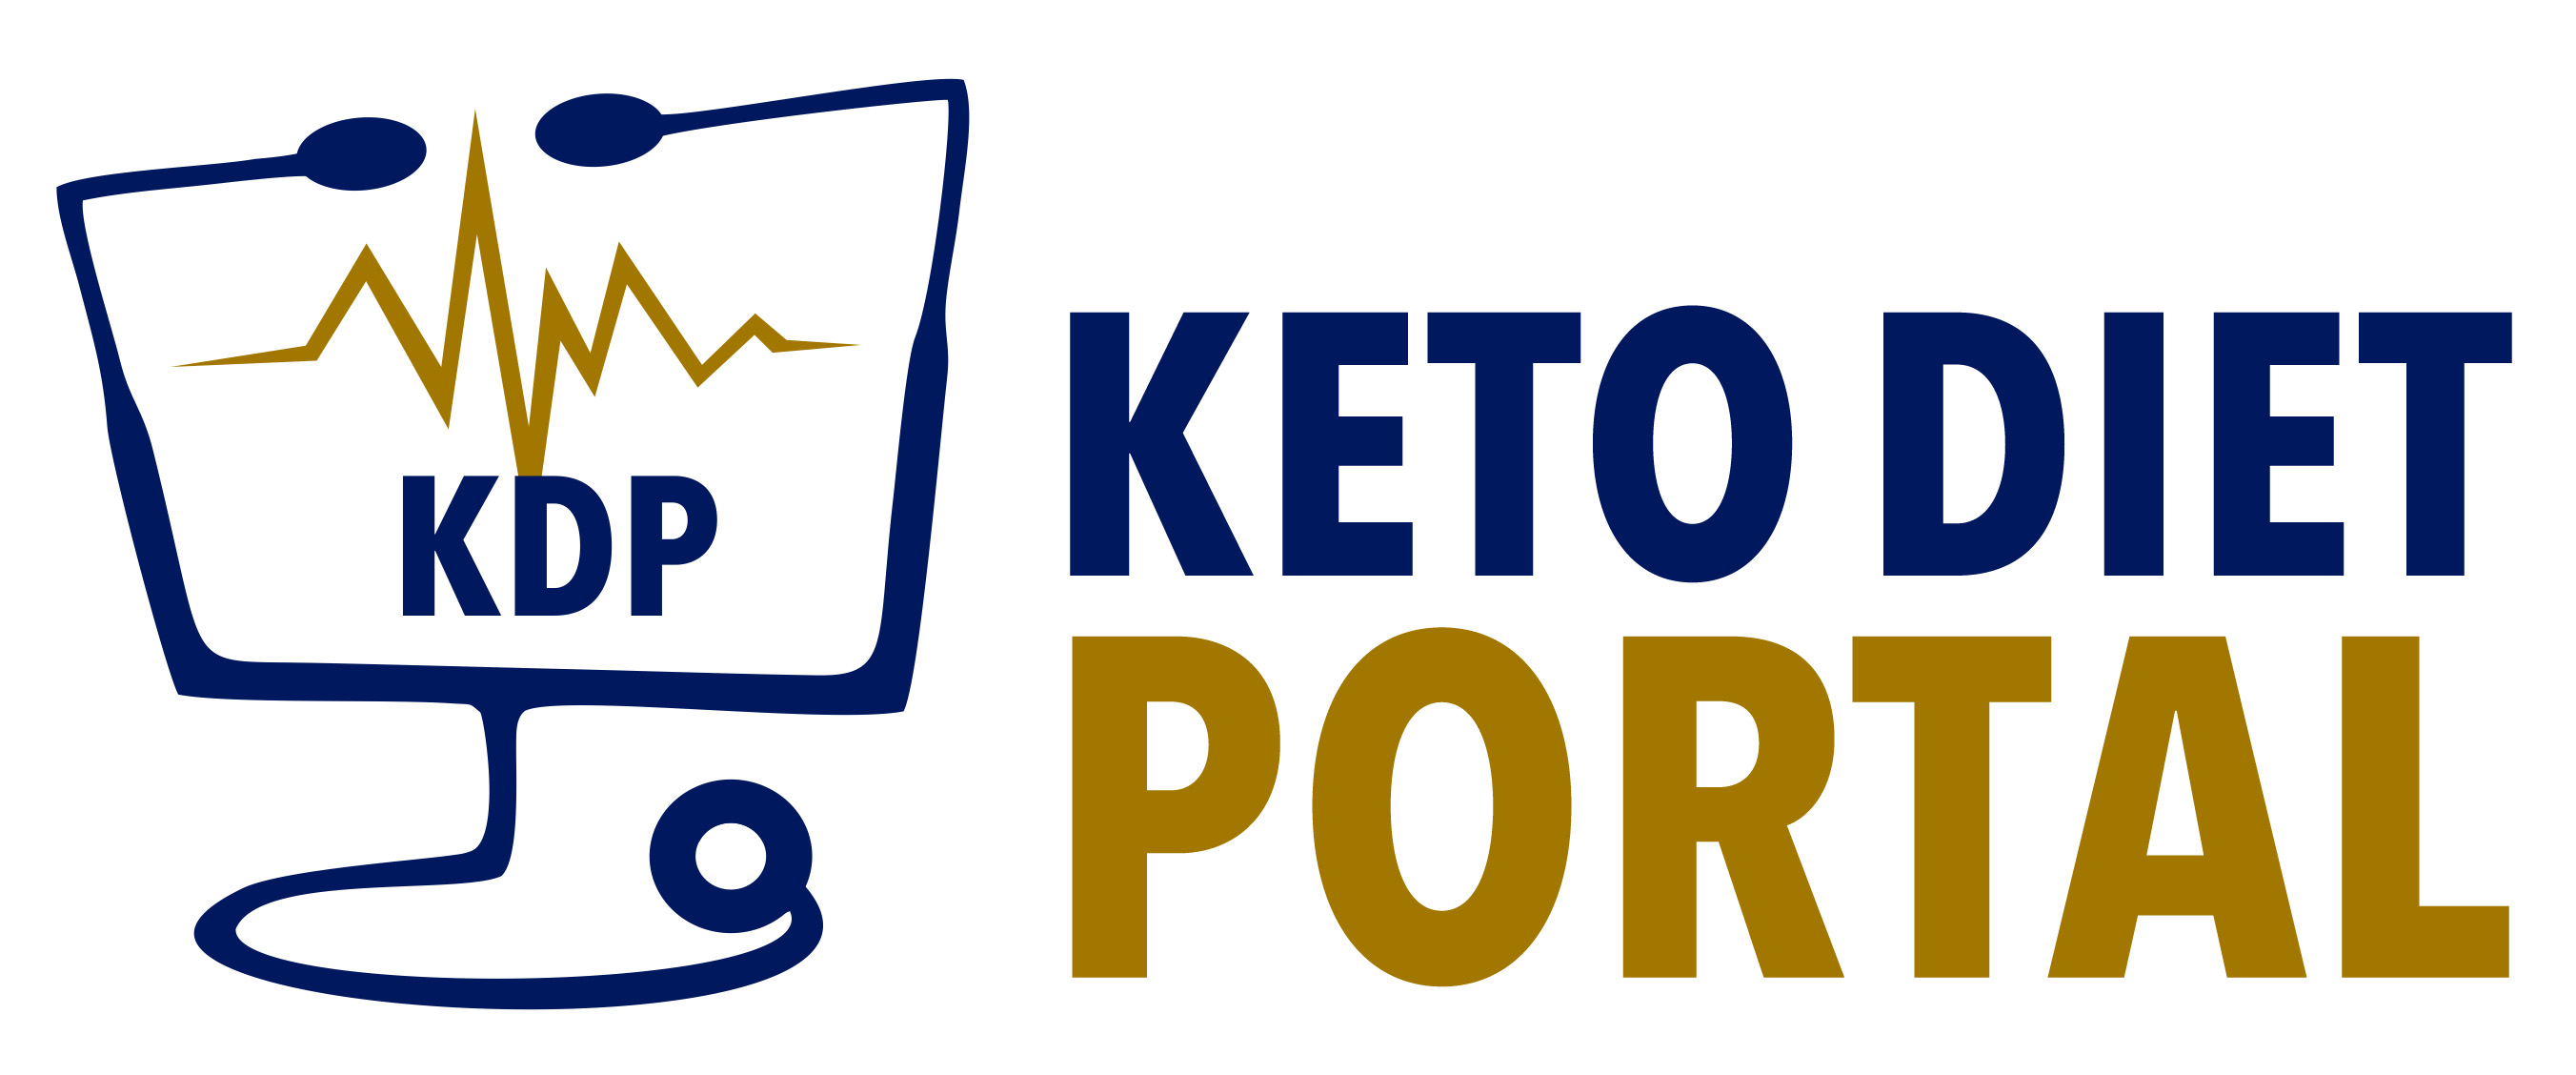 keto diet portal keto diet portal for ketogenic diet research